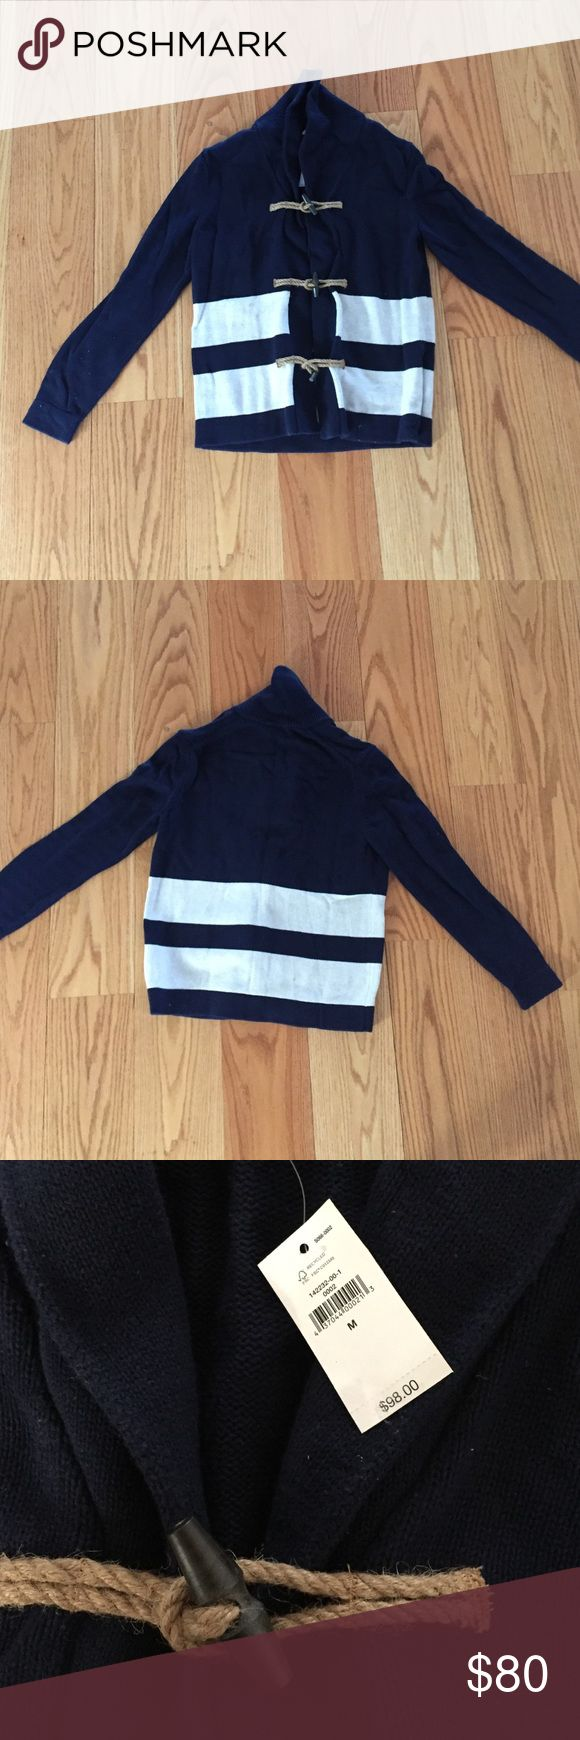 GAP Nautical Cardigan 100% cotton Navy Blue and White Striped Nautical Cardigan NEVER WORN GAP Sweaters Cardigans